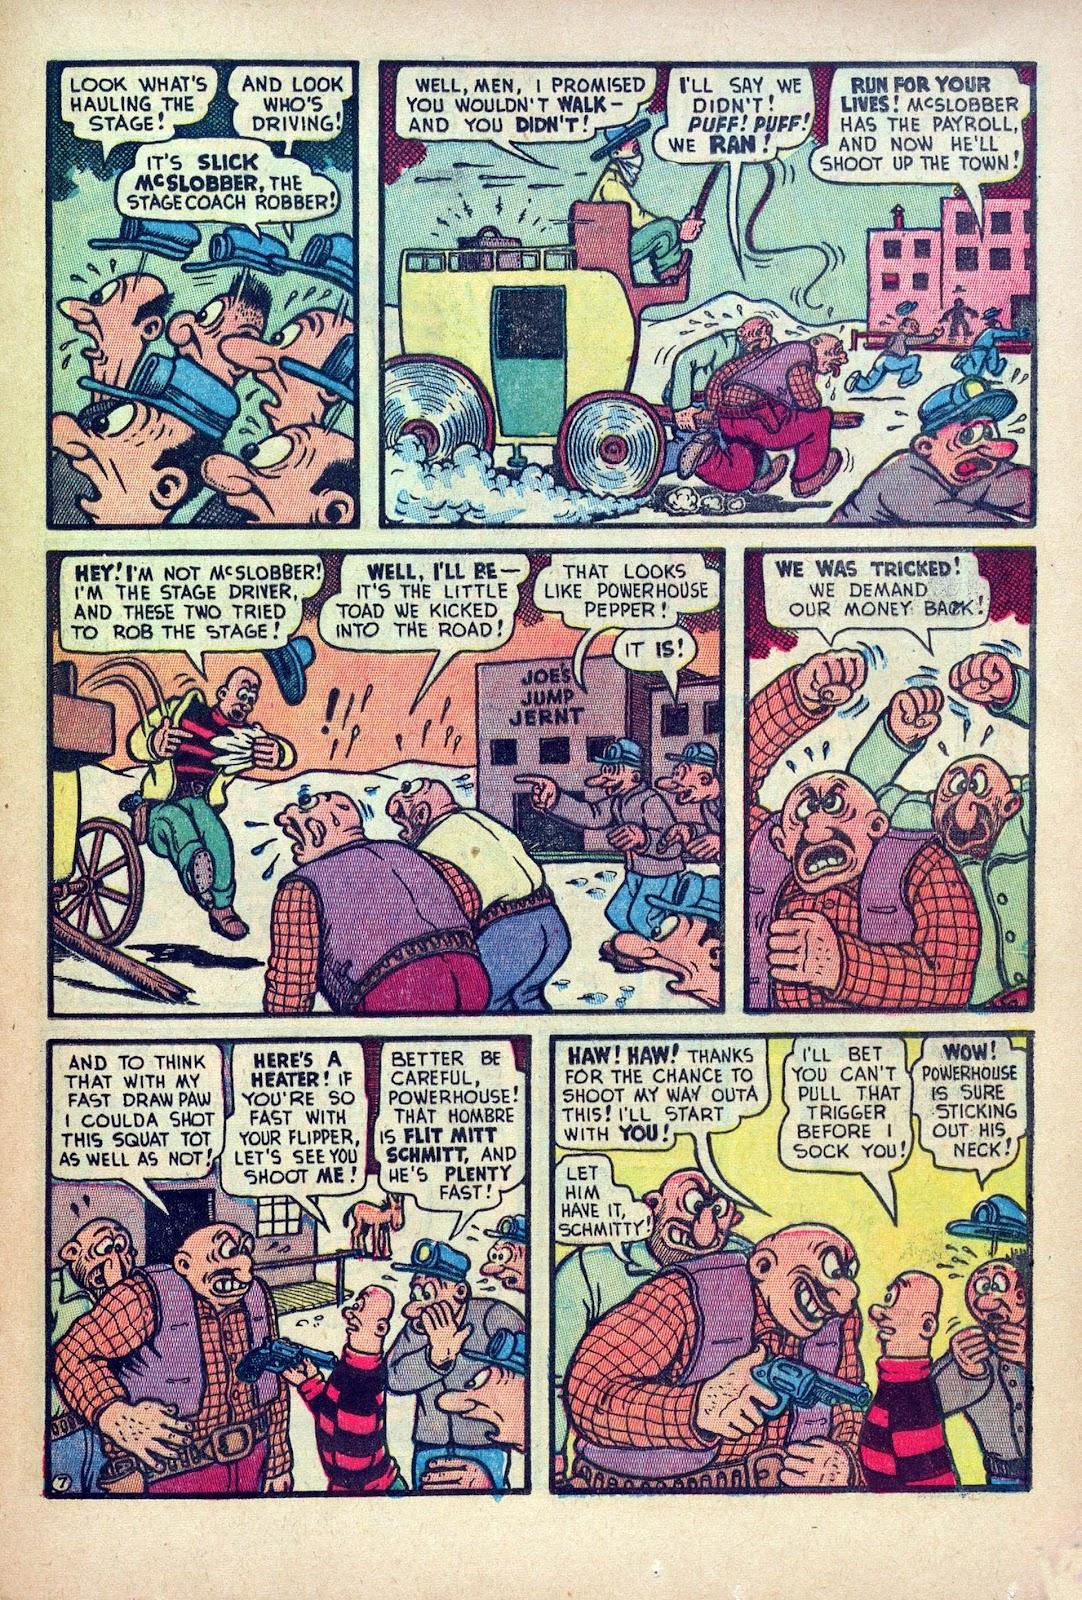 Read online Joker Comics comic -  Issue #31 - 25